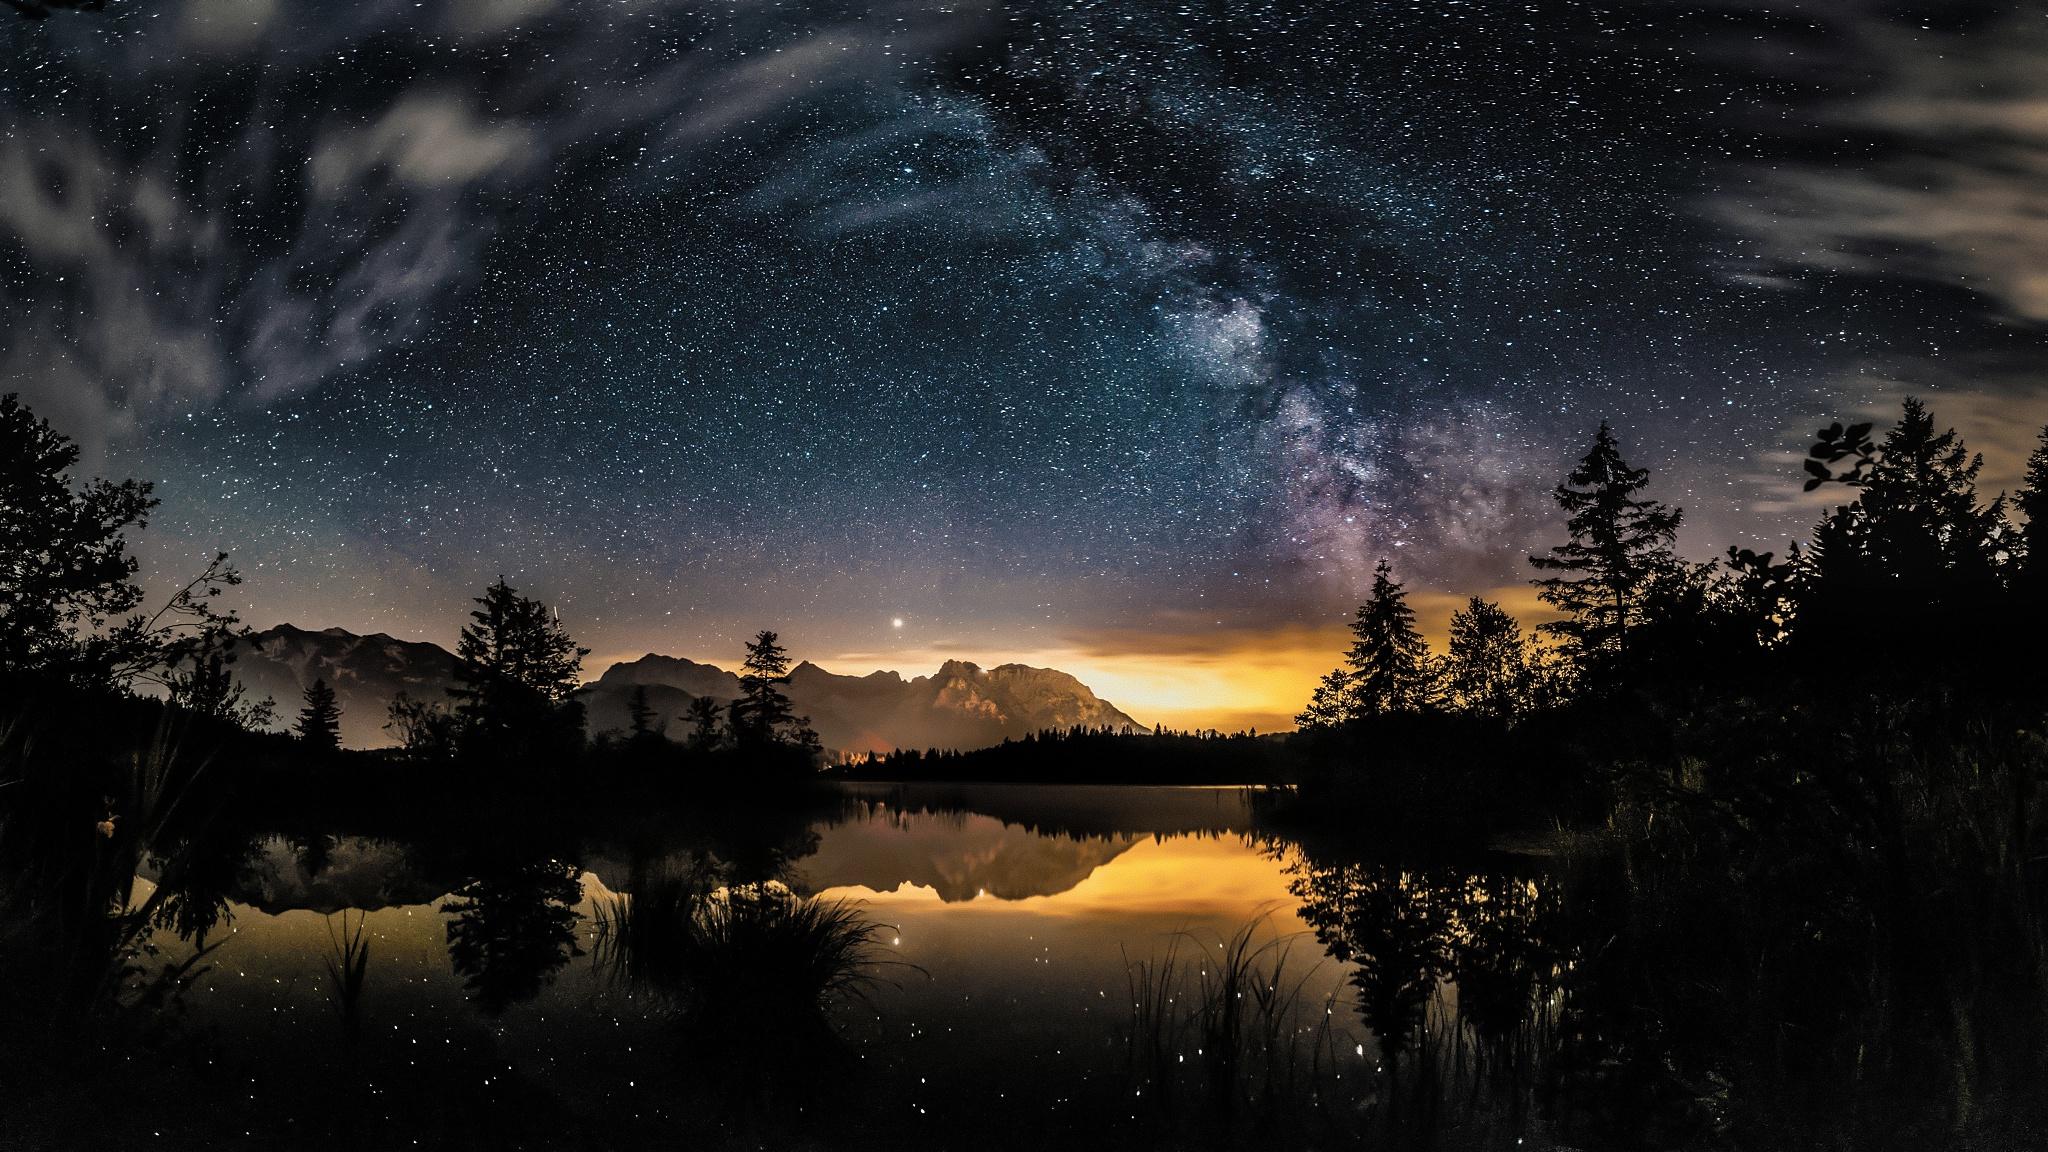 Night Hd Wallpaper Background Image 2048x1152 Id